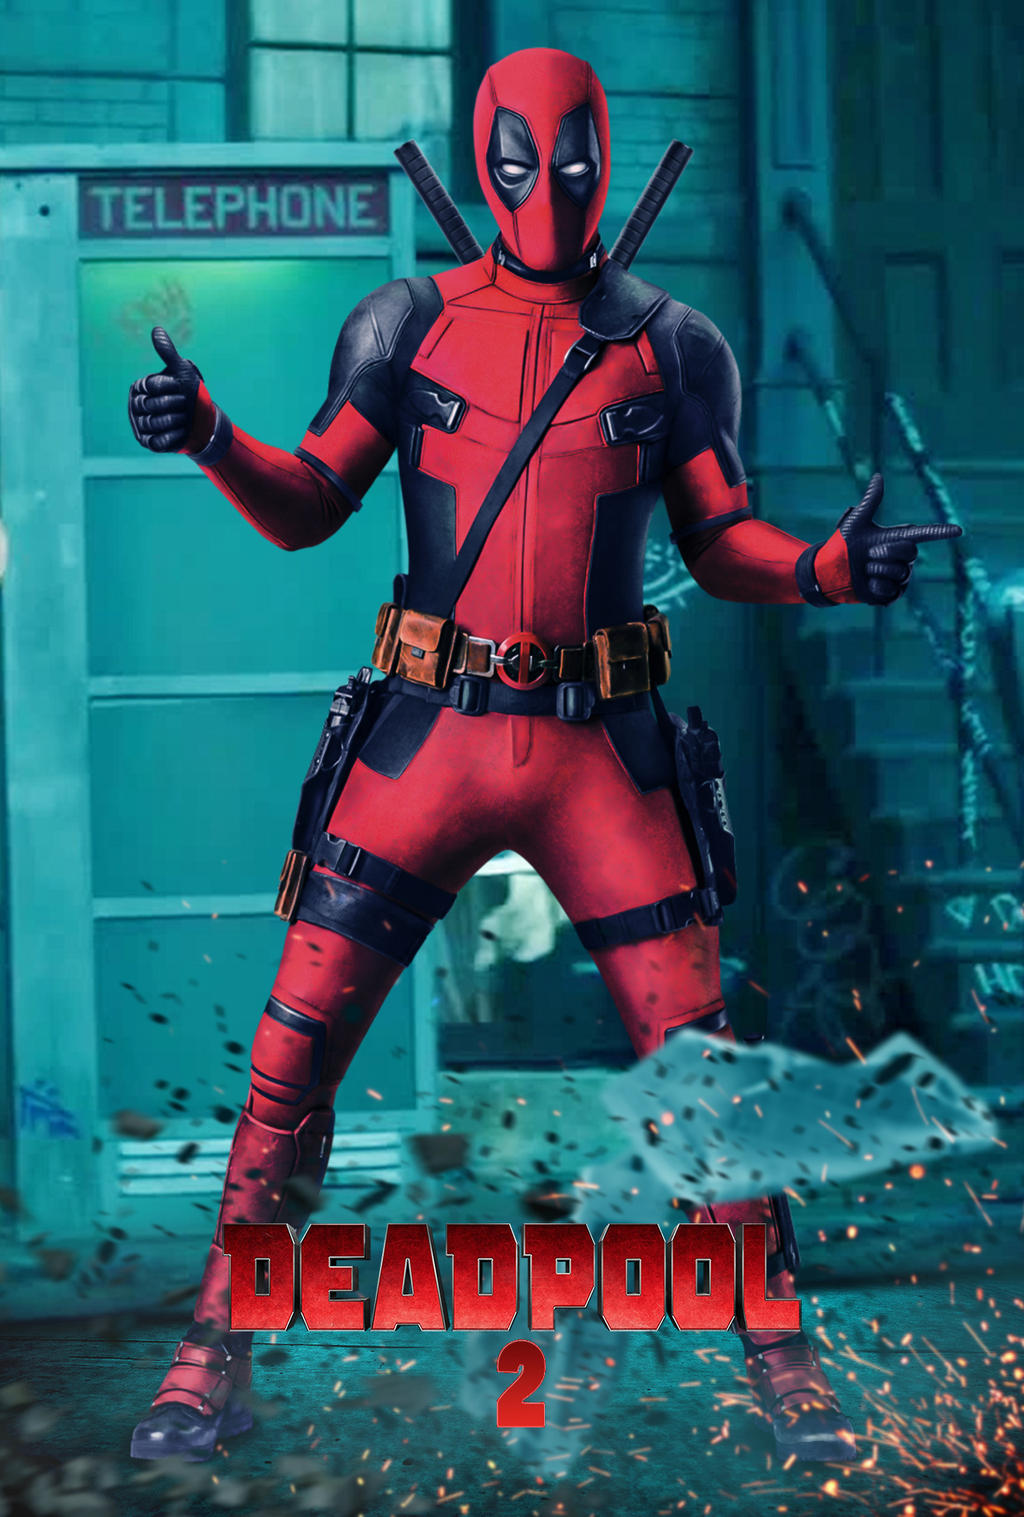 Deadpool 2 Poster 2018 by edaba7 on DeviantArt